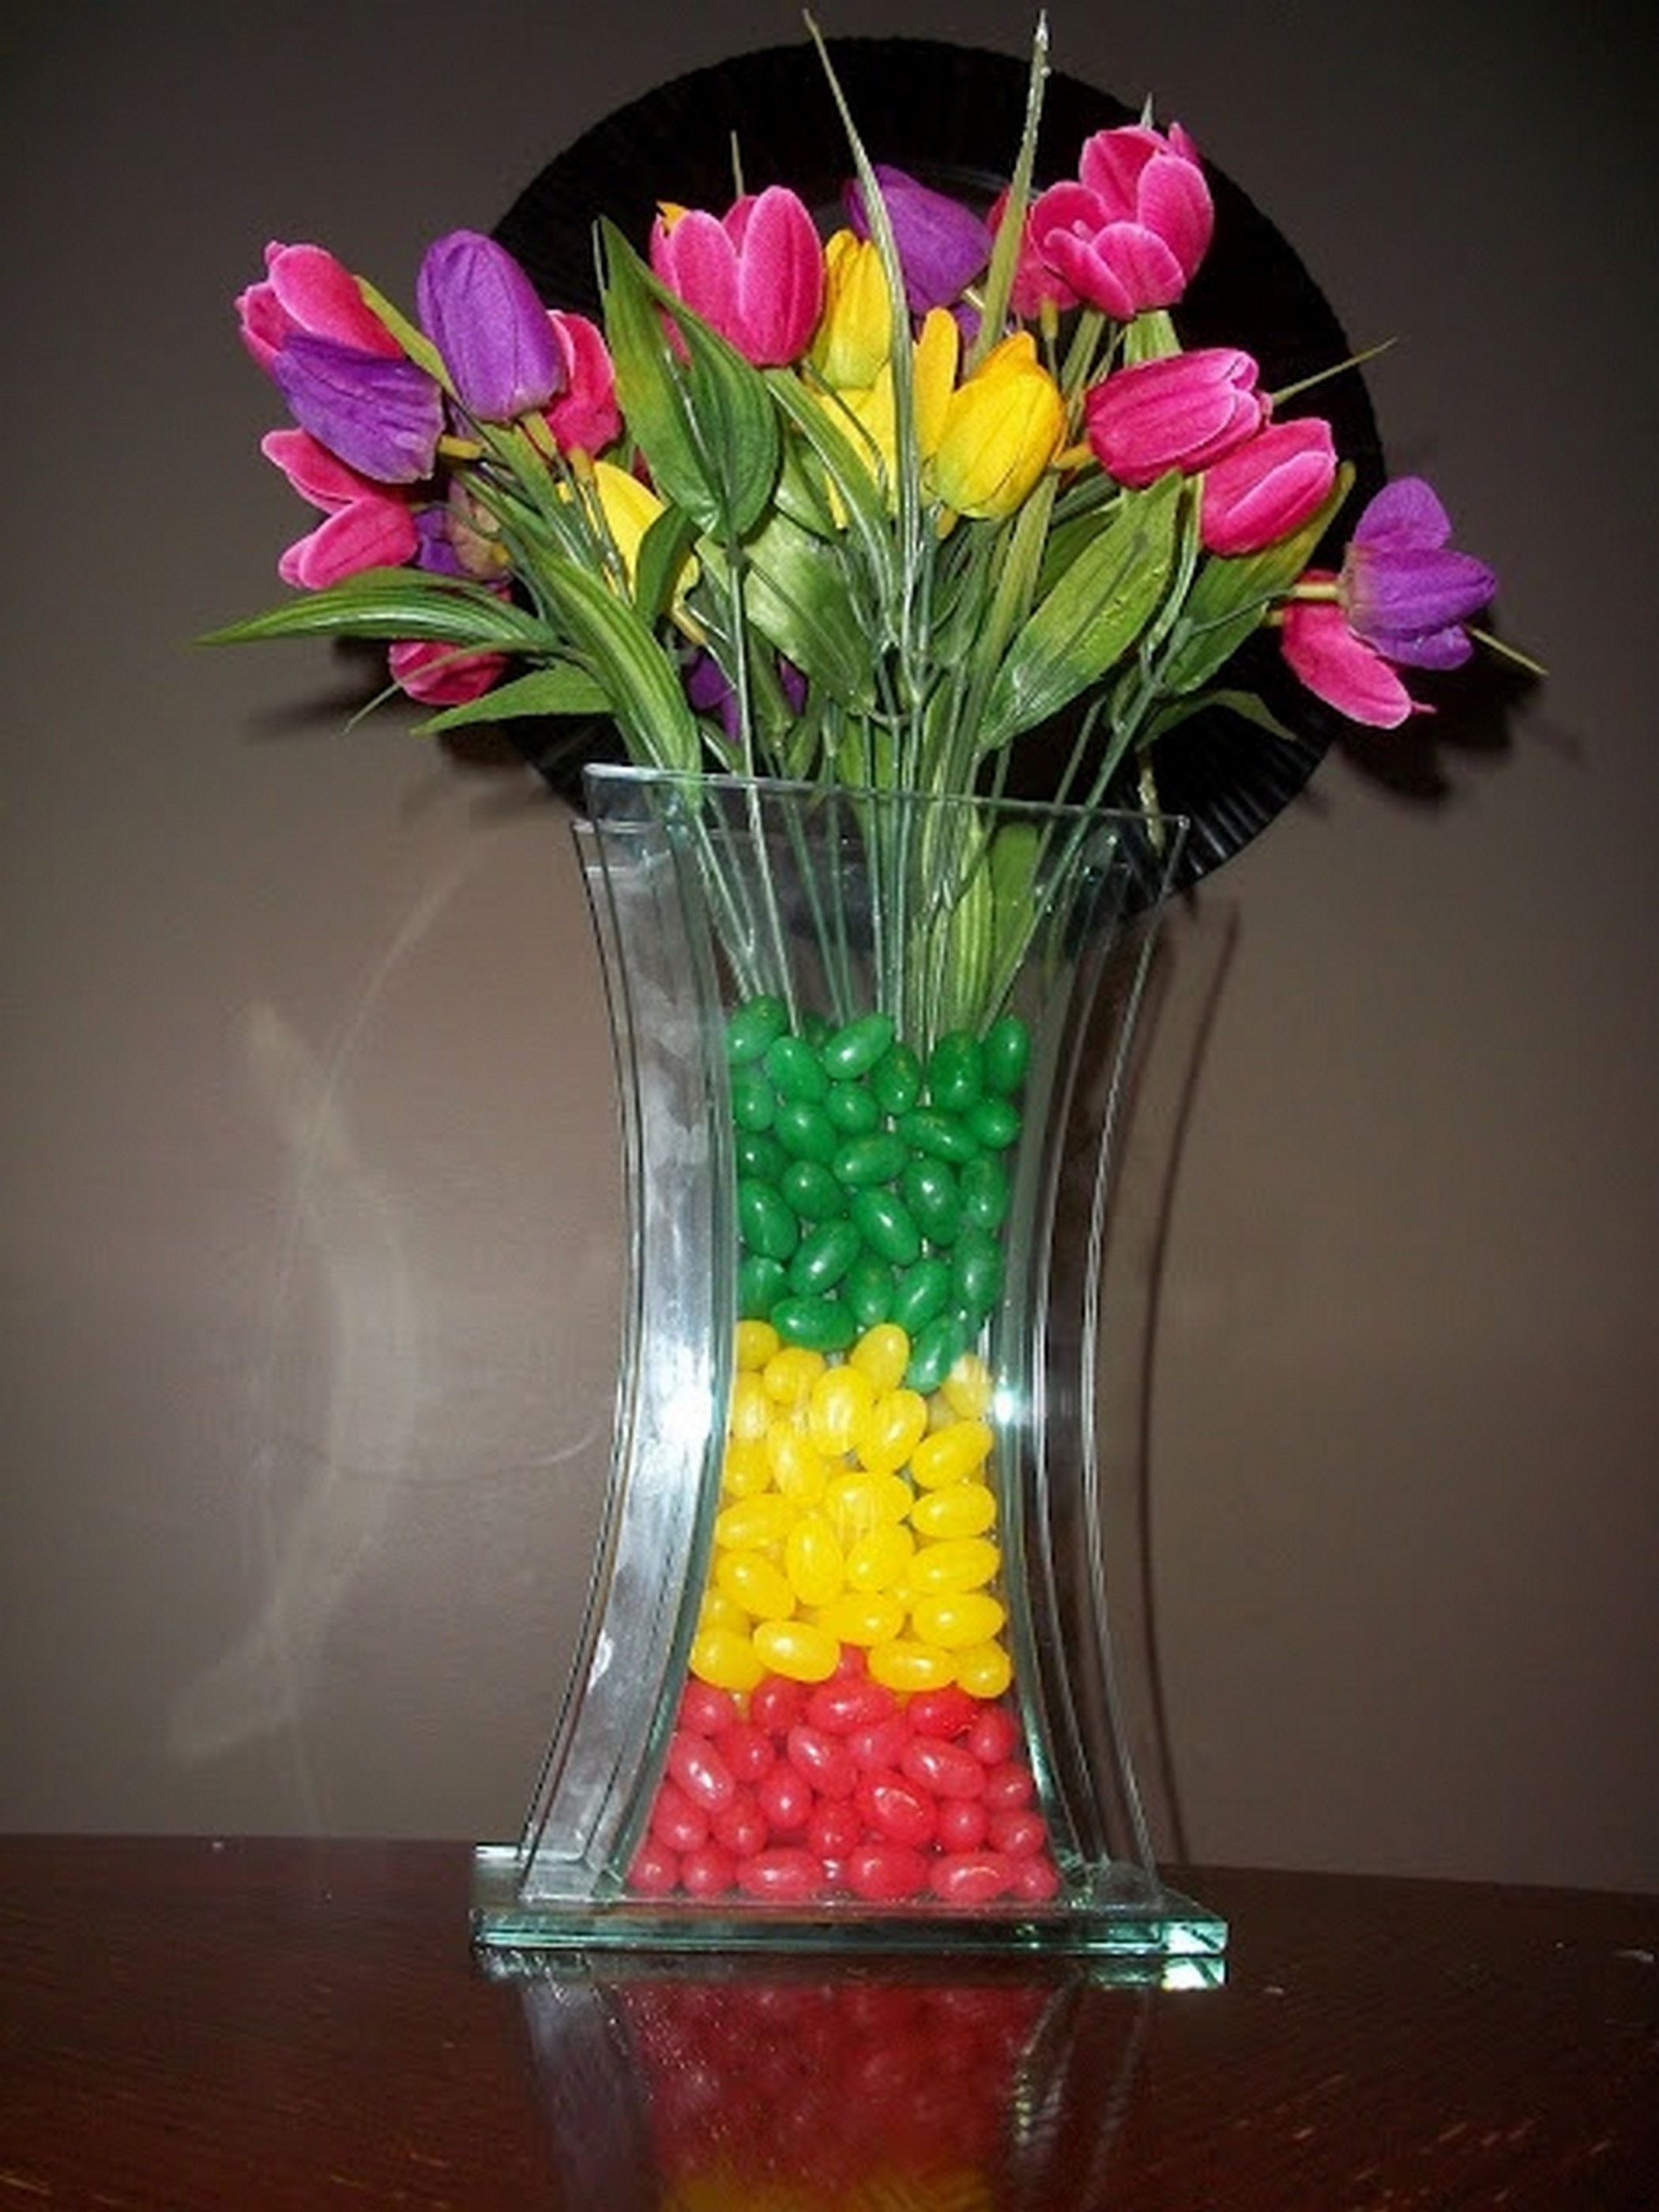 Water Beads for Vases Of Vase Filler Beads Photos 15 Cheap and Easy Diy Vase Filler Ideas 3h within 15 Cheap and Easy Diy Vase Filler Ideas 3h Vases Flower I 0d Scheme